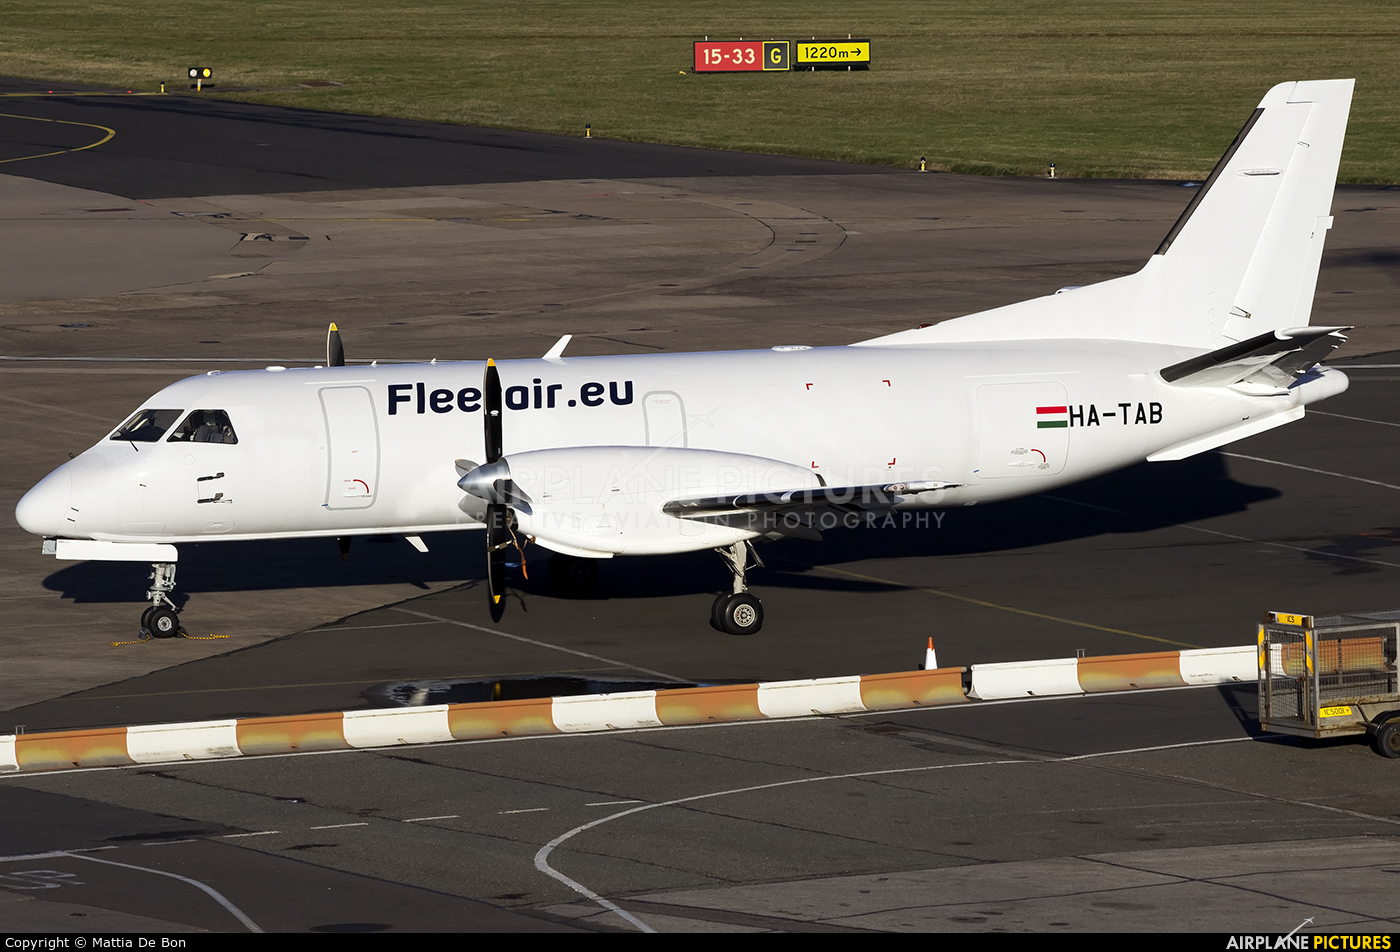 Fleet Air International HA-TAB aircraft at Birmingham